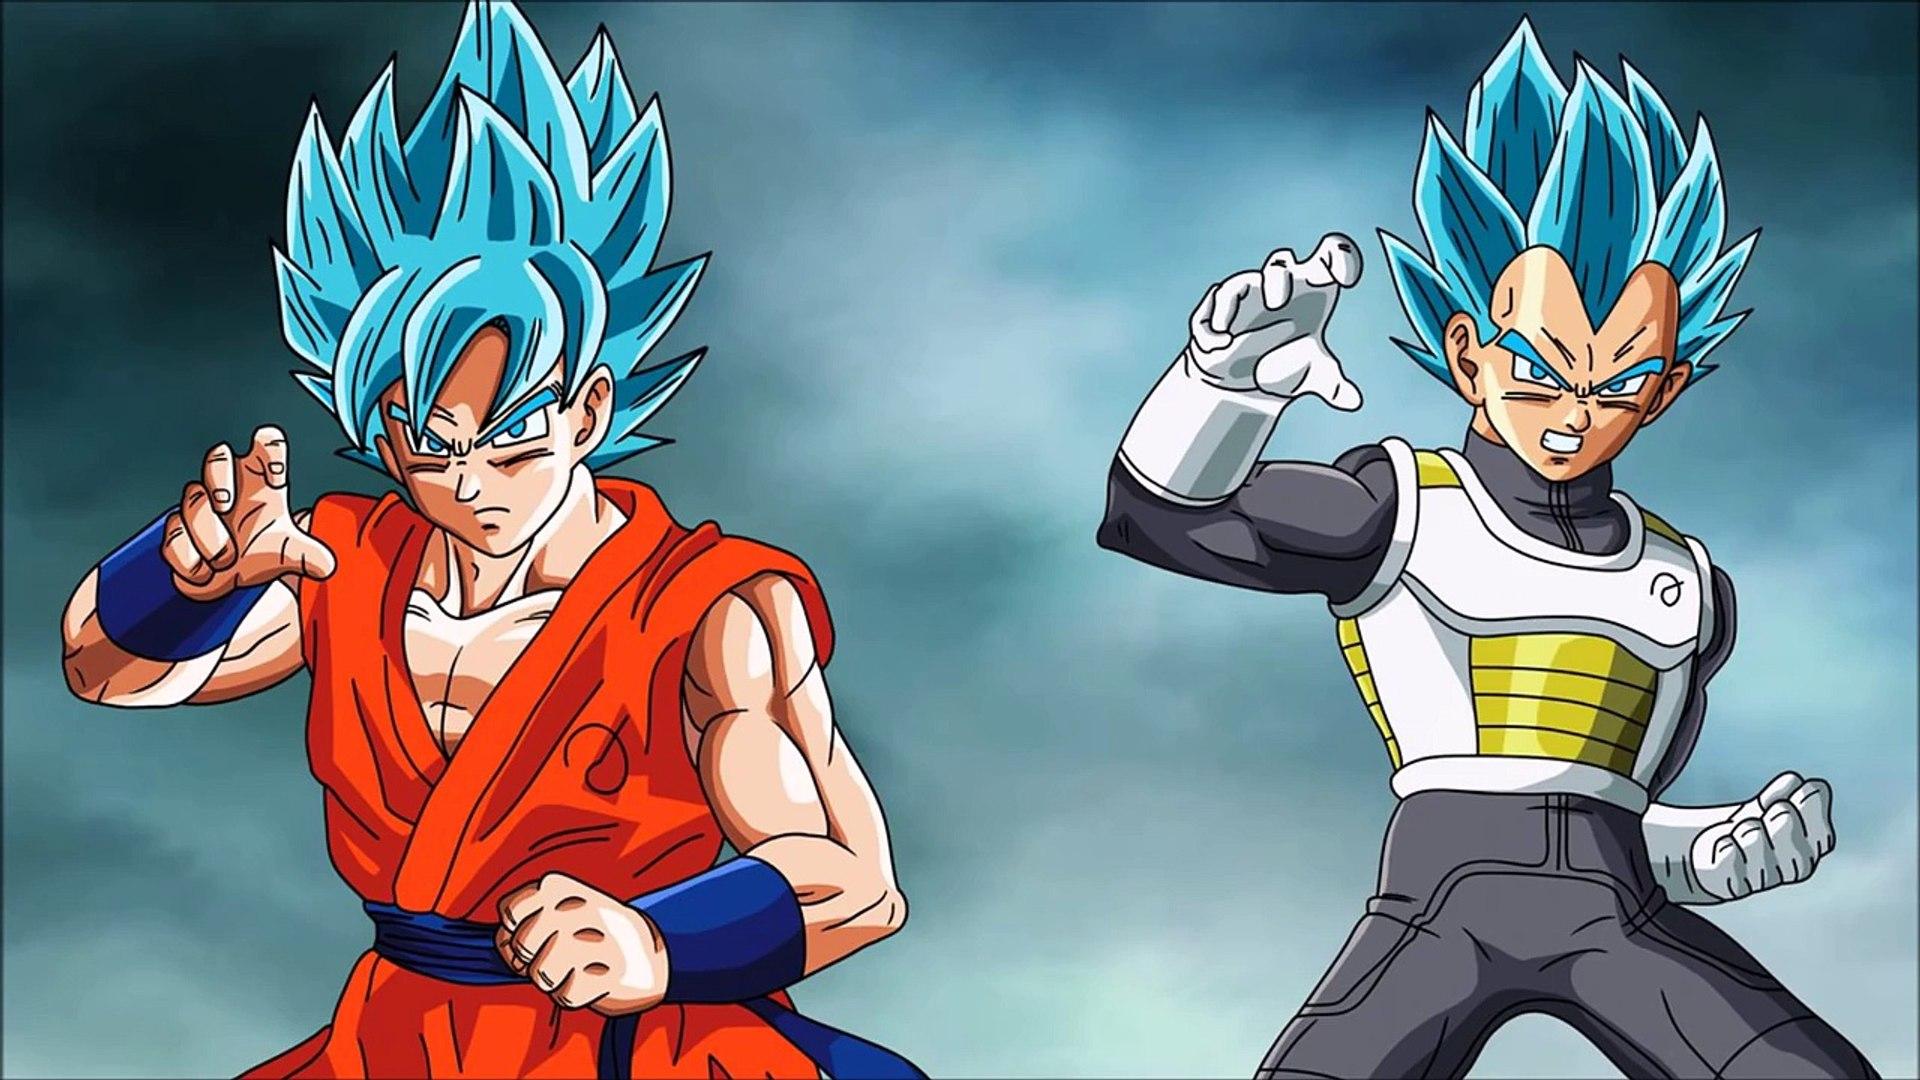 Dragon Ball Z Resurrection F Ost A Deathmatch With Golden